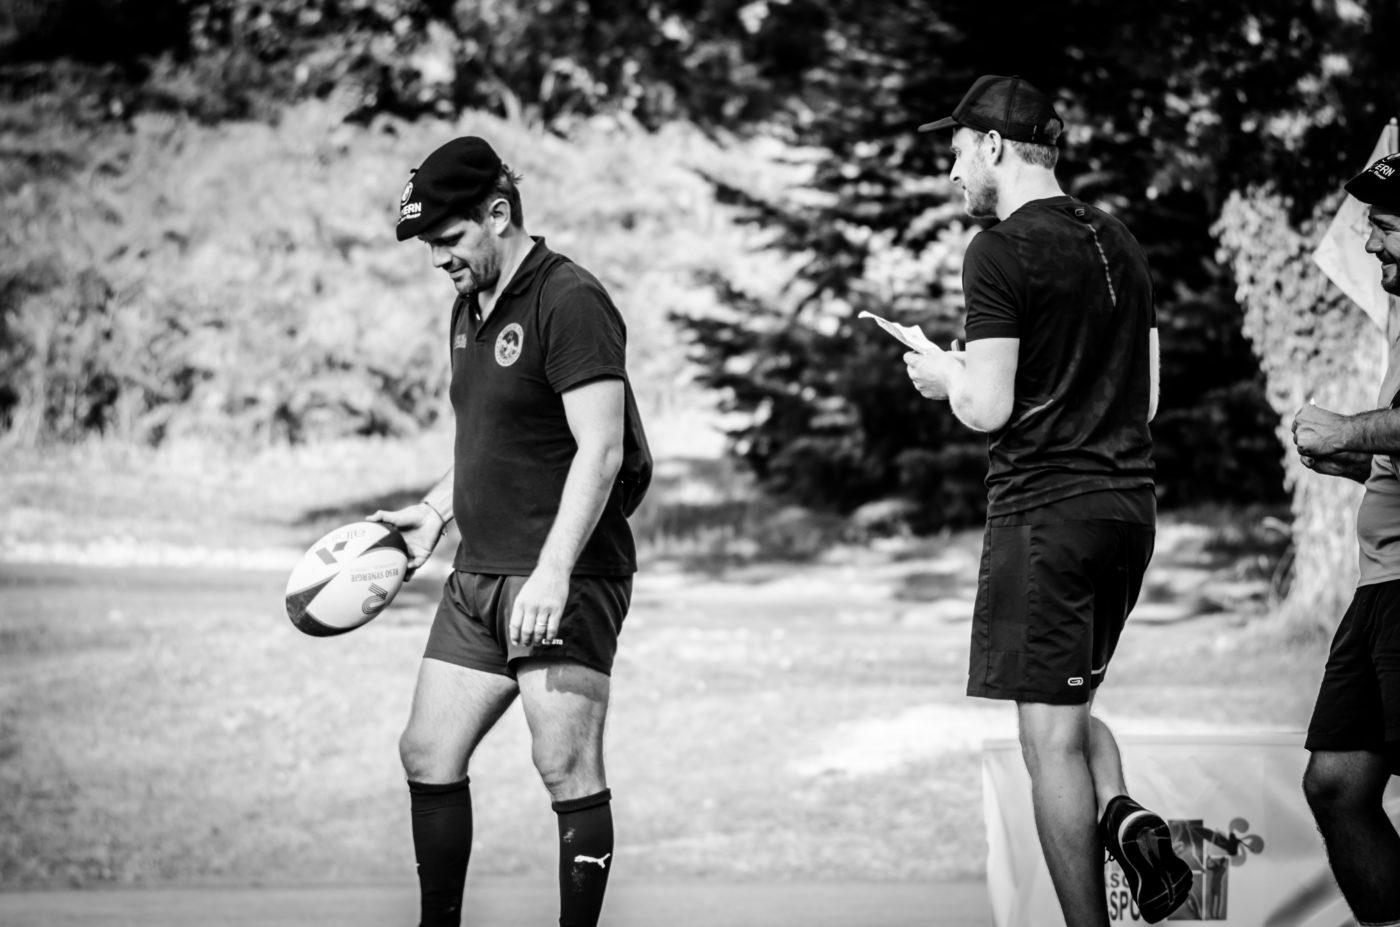 Événement Rugby Golf IRPB 2019 Chantaco Inter réseau Pays basque Agence Erronda alexis gavillon